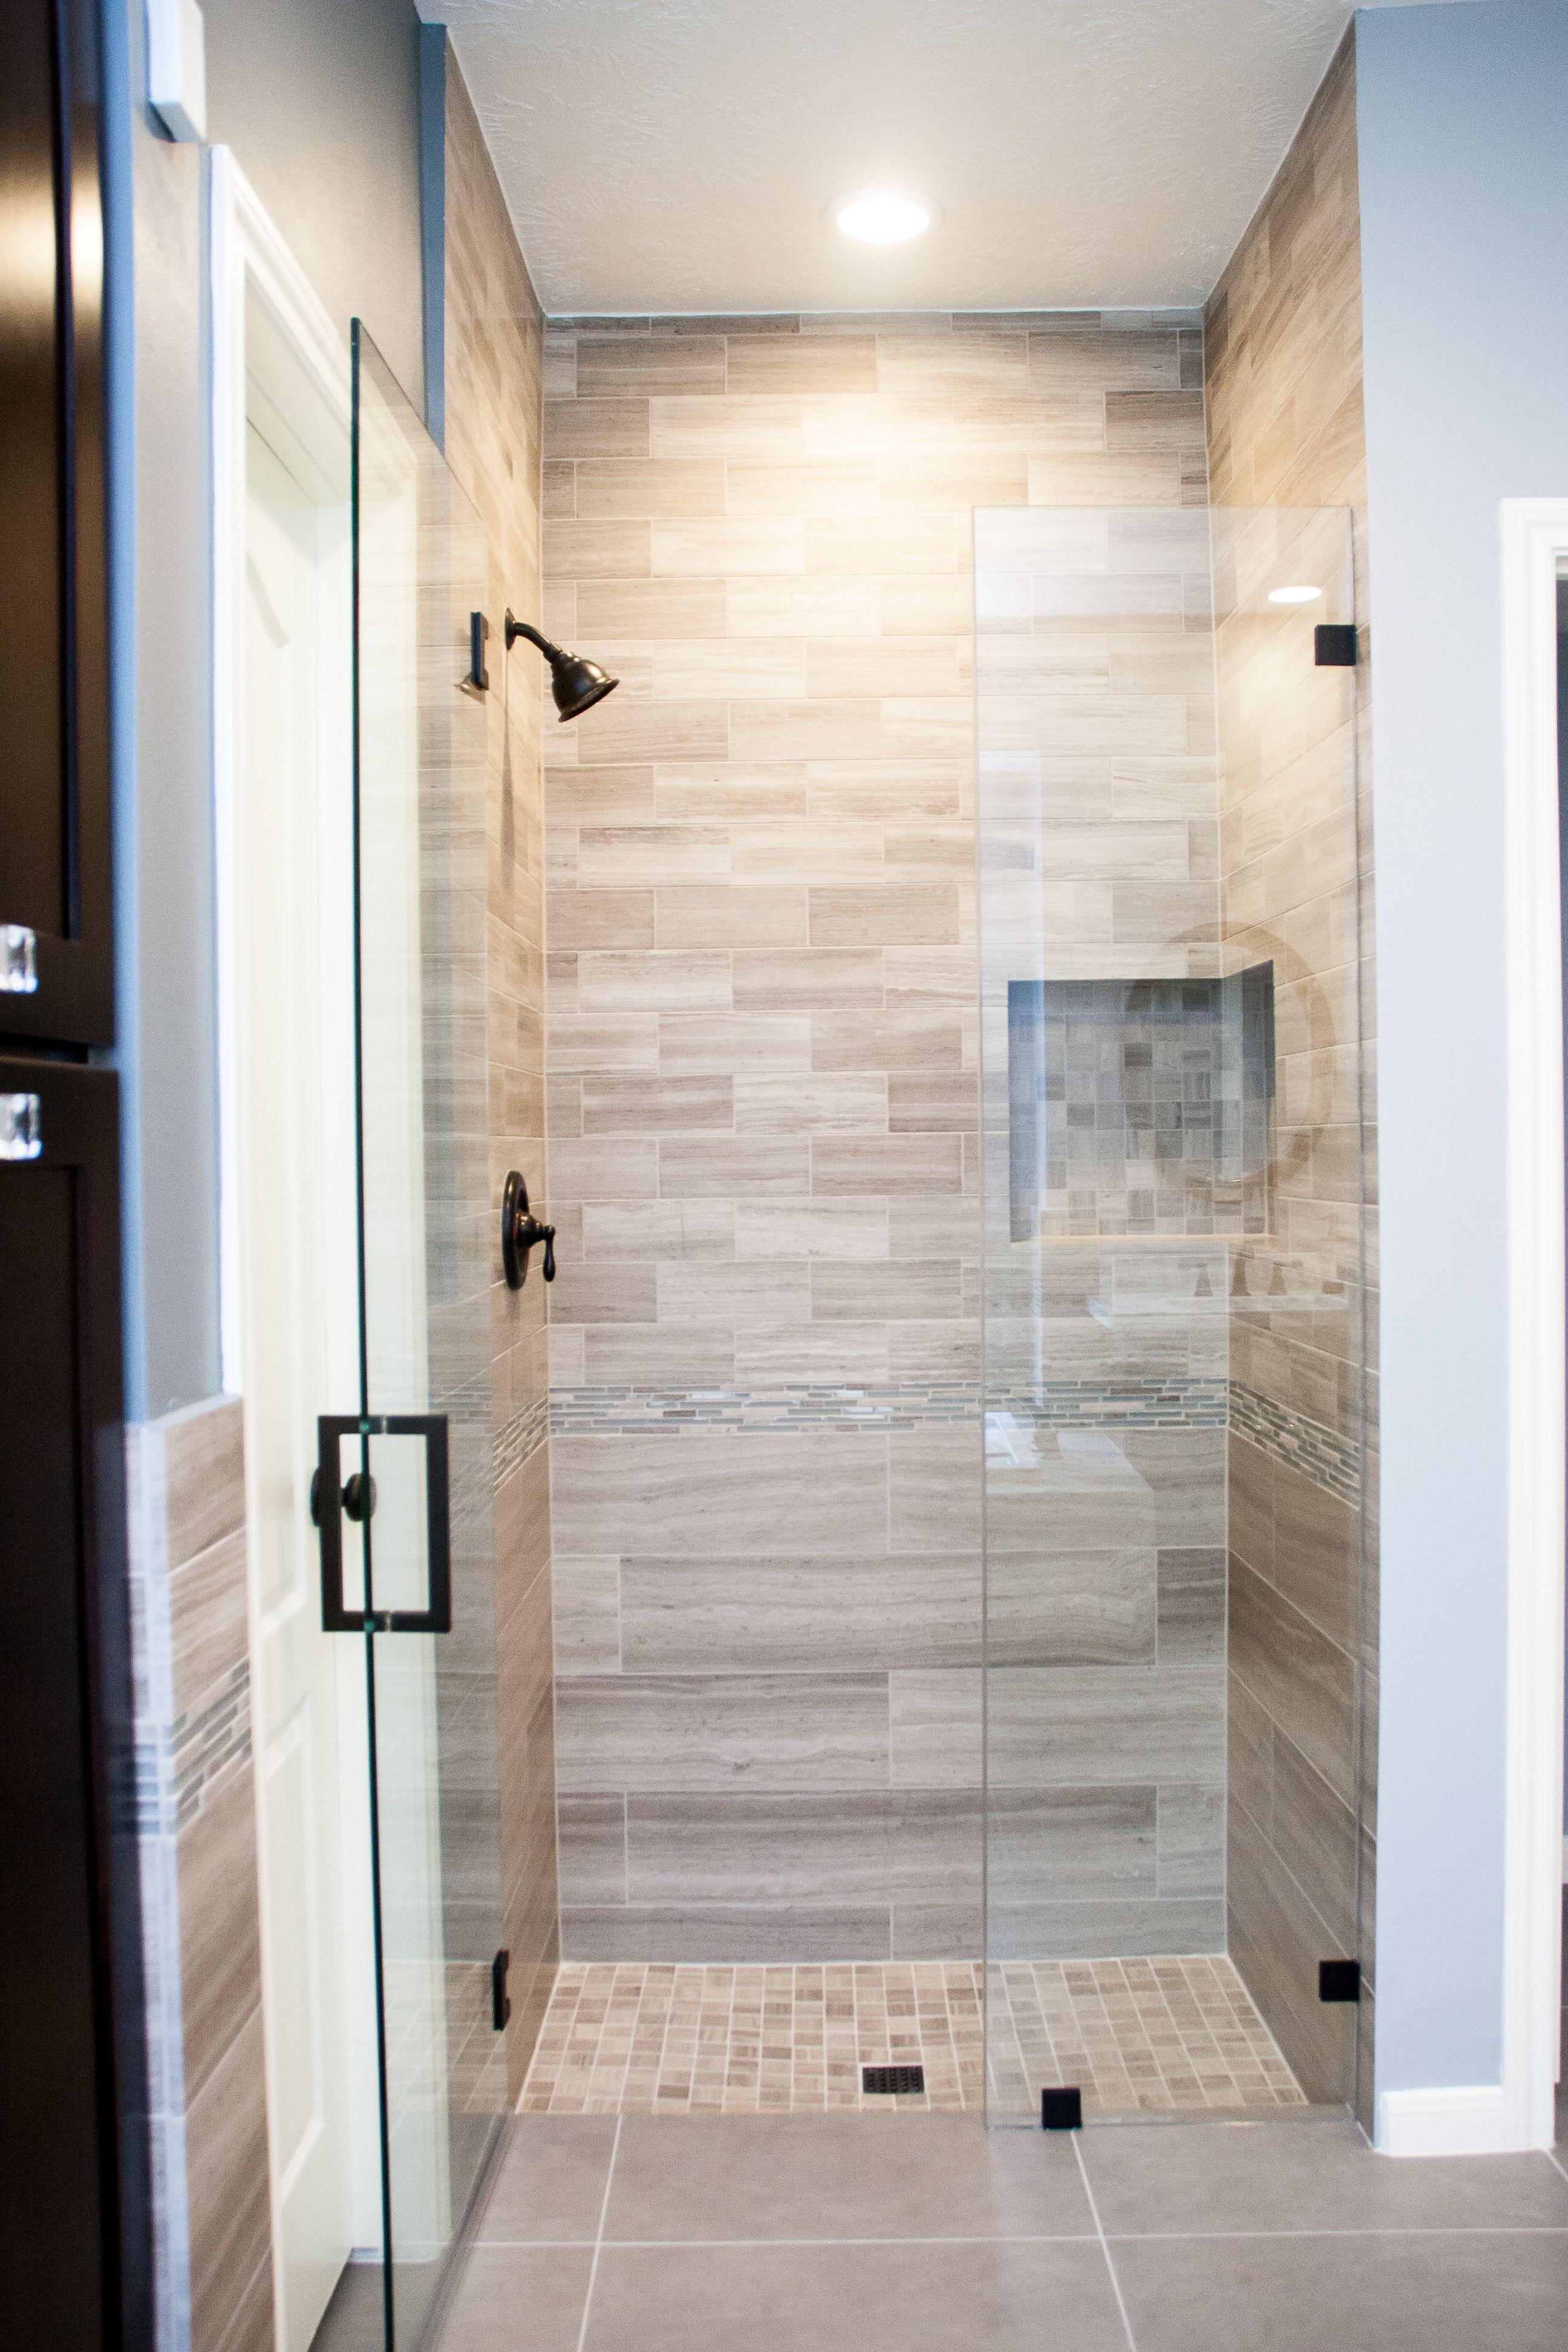 remodel com coryc bathroom greensboro within remodeling nc boise me vivomurcia modern